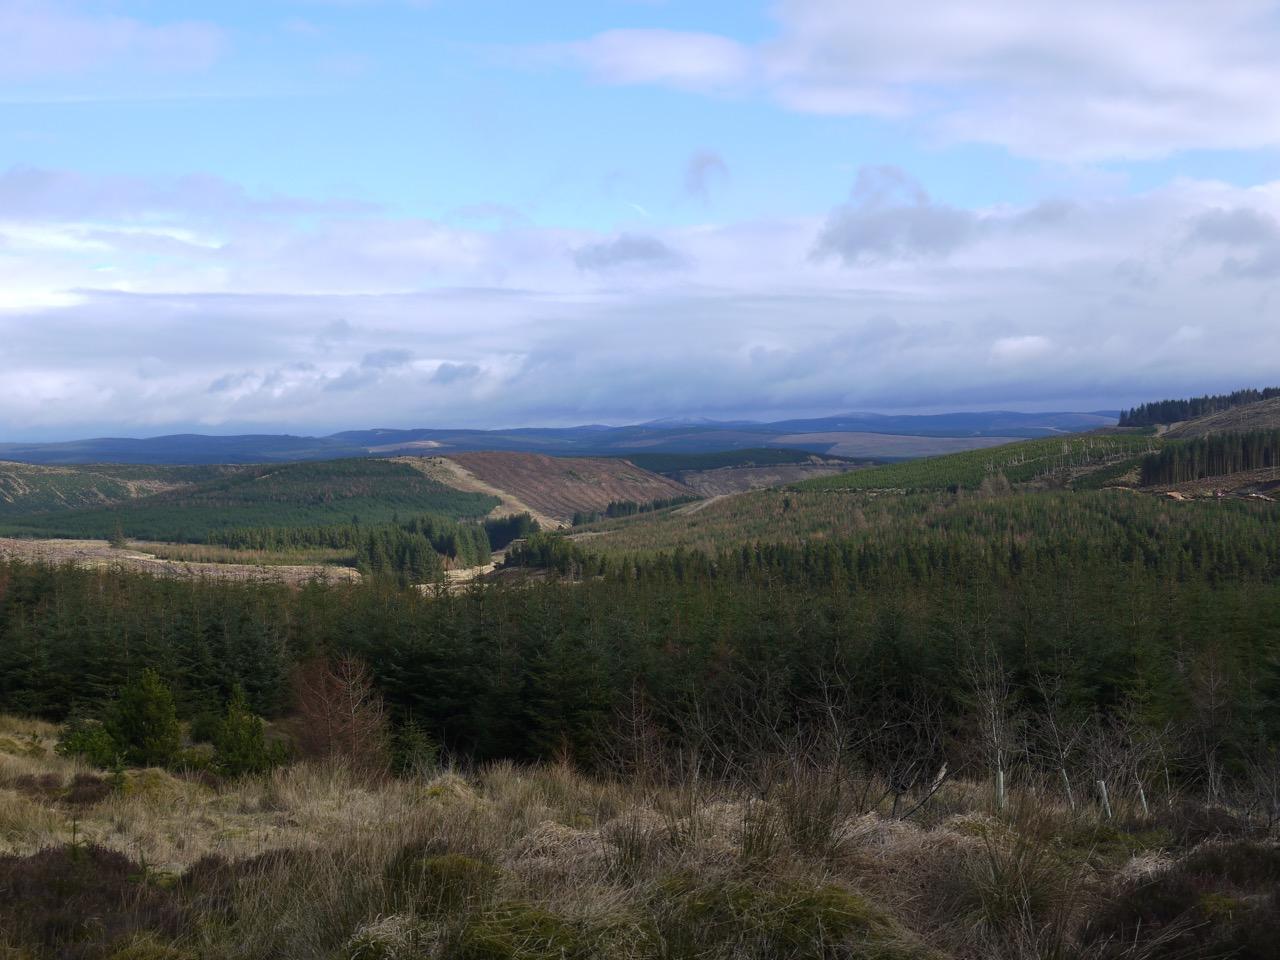 Distant Wisp Hill